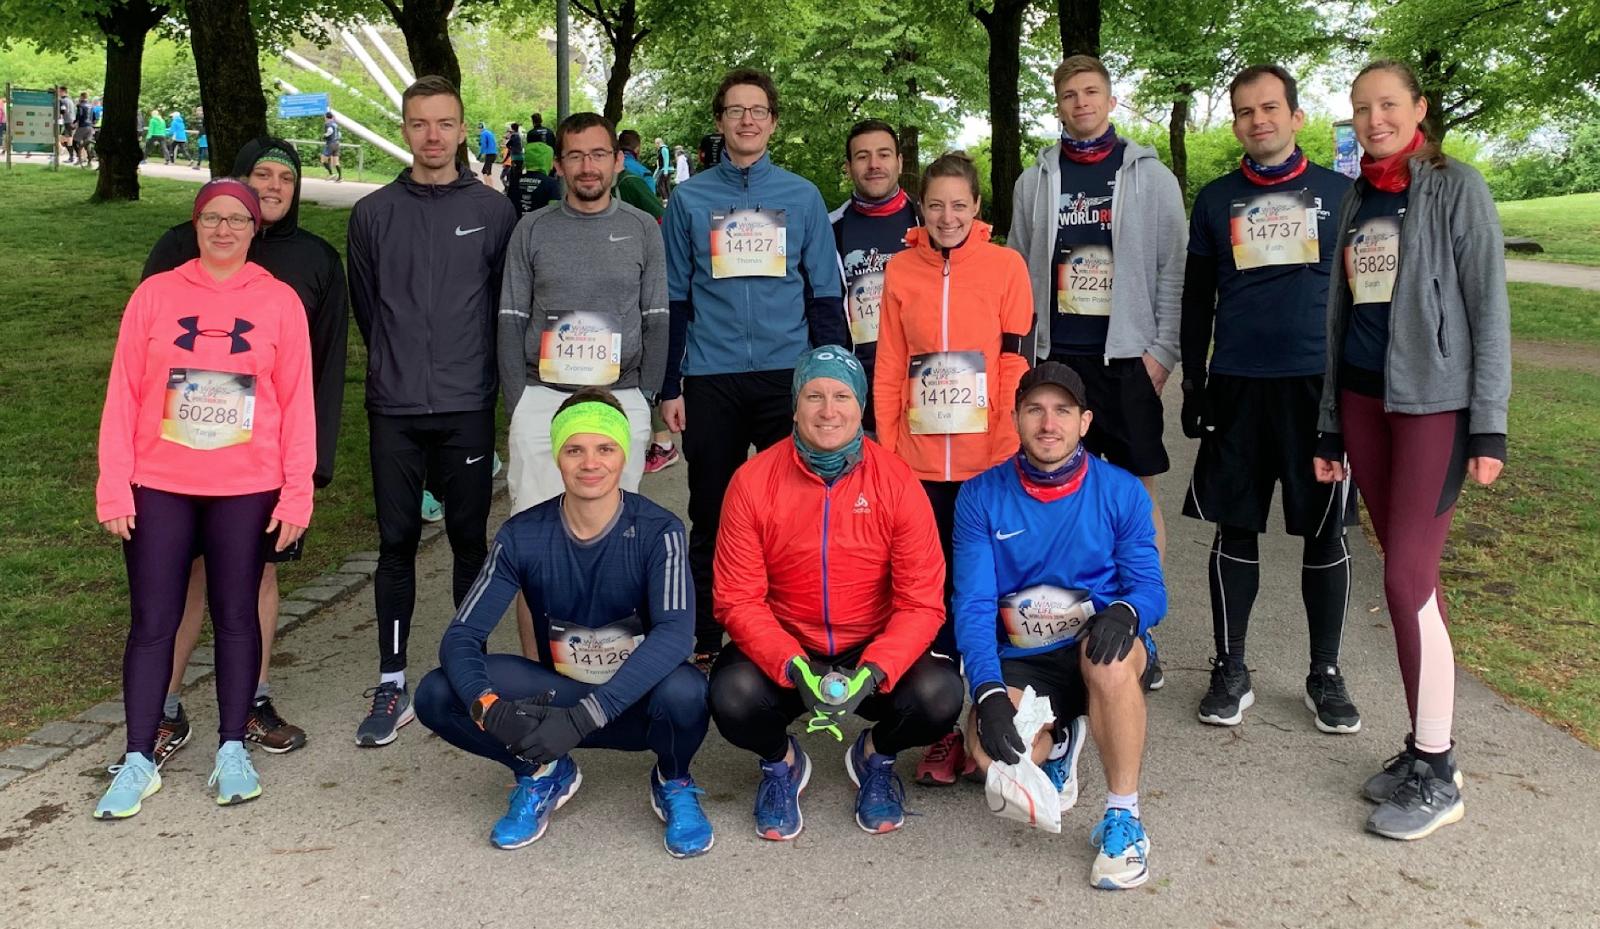 Das Team Comsysto Reply kurz vor dem Start zum Wings for Life World Run 2019